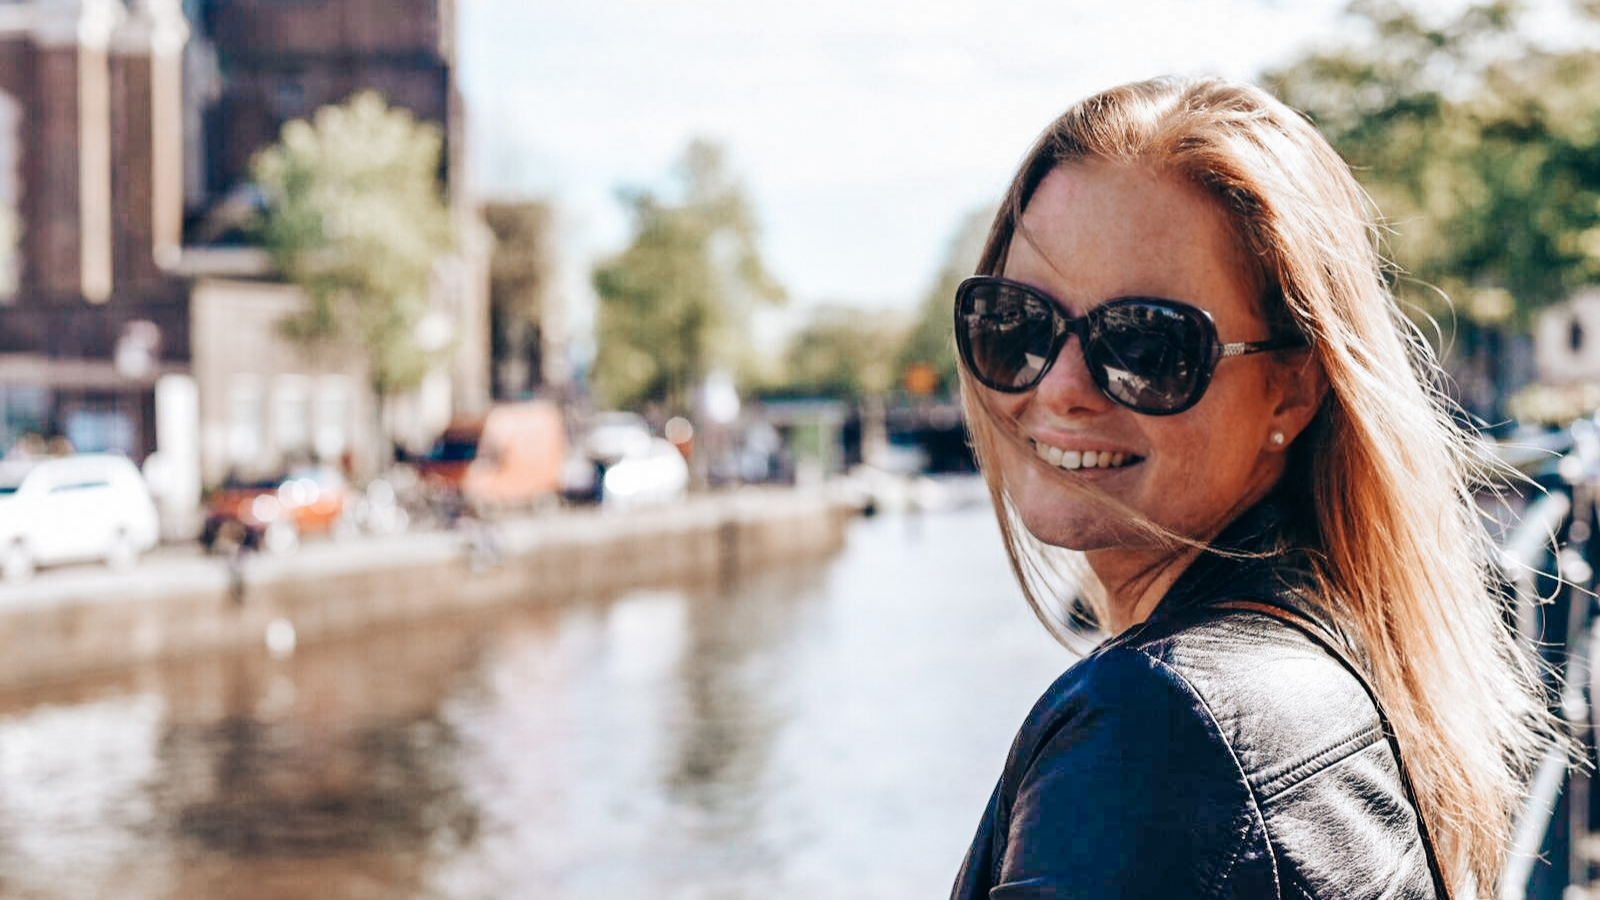 Amsterdam 2.0